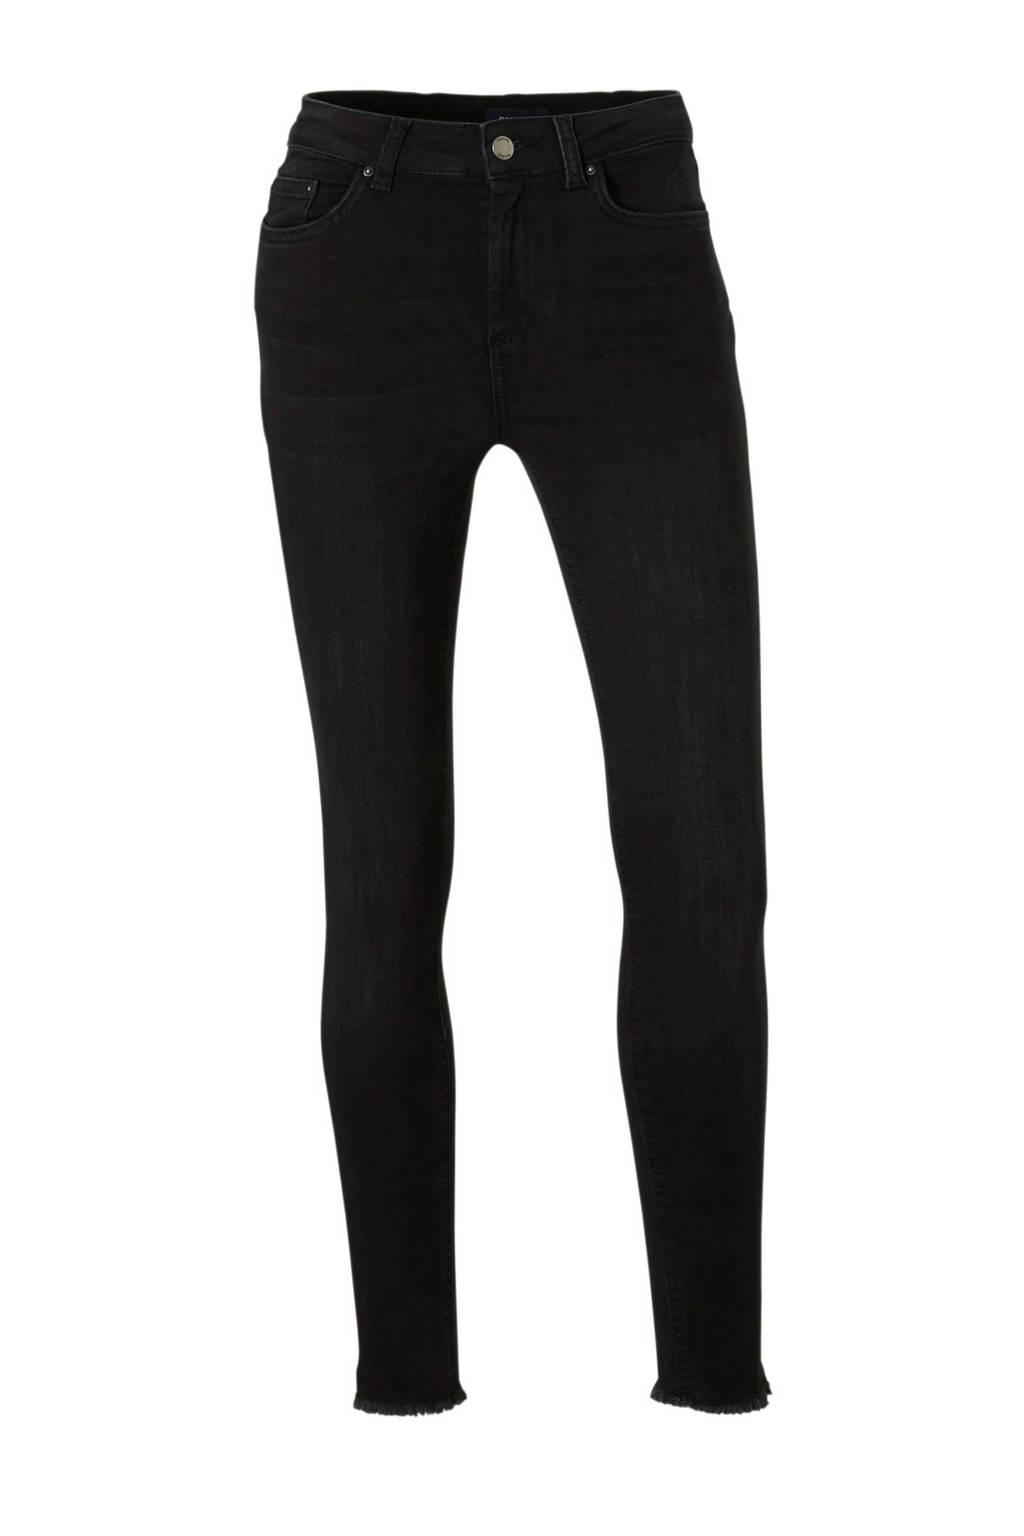 ESPRIT Women Casual straight fit jeans, Zwart